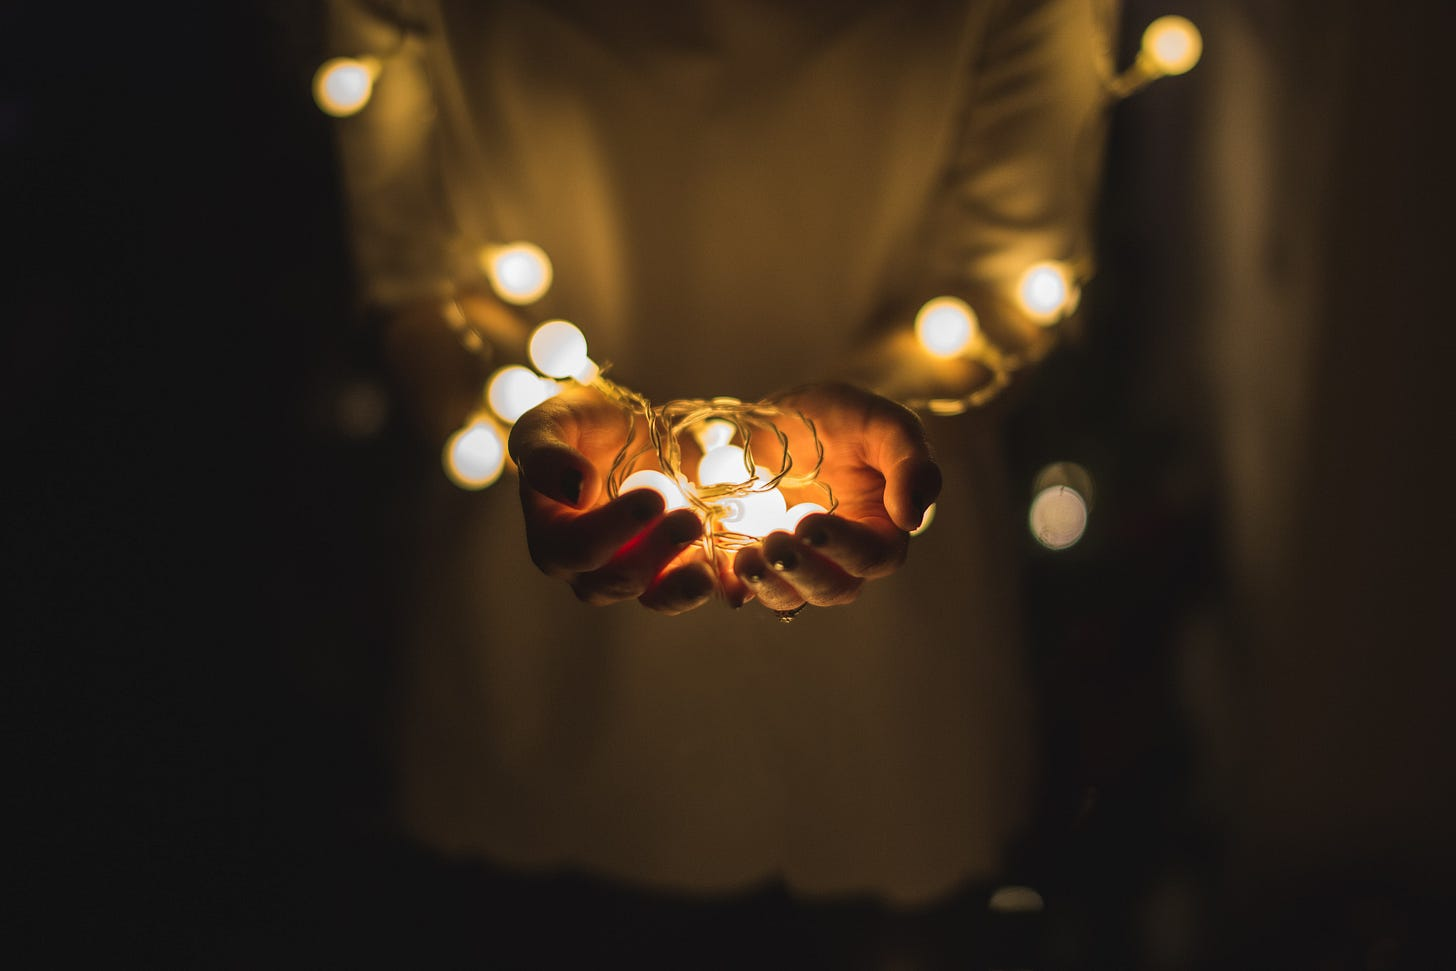 hands holding illuminated string lights